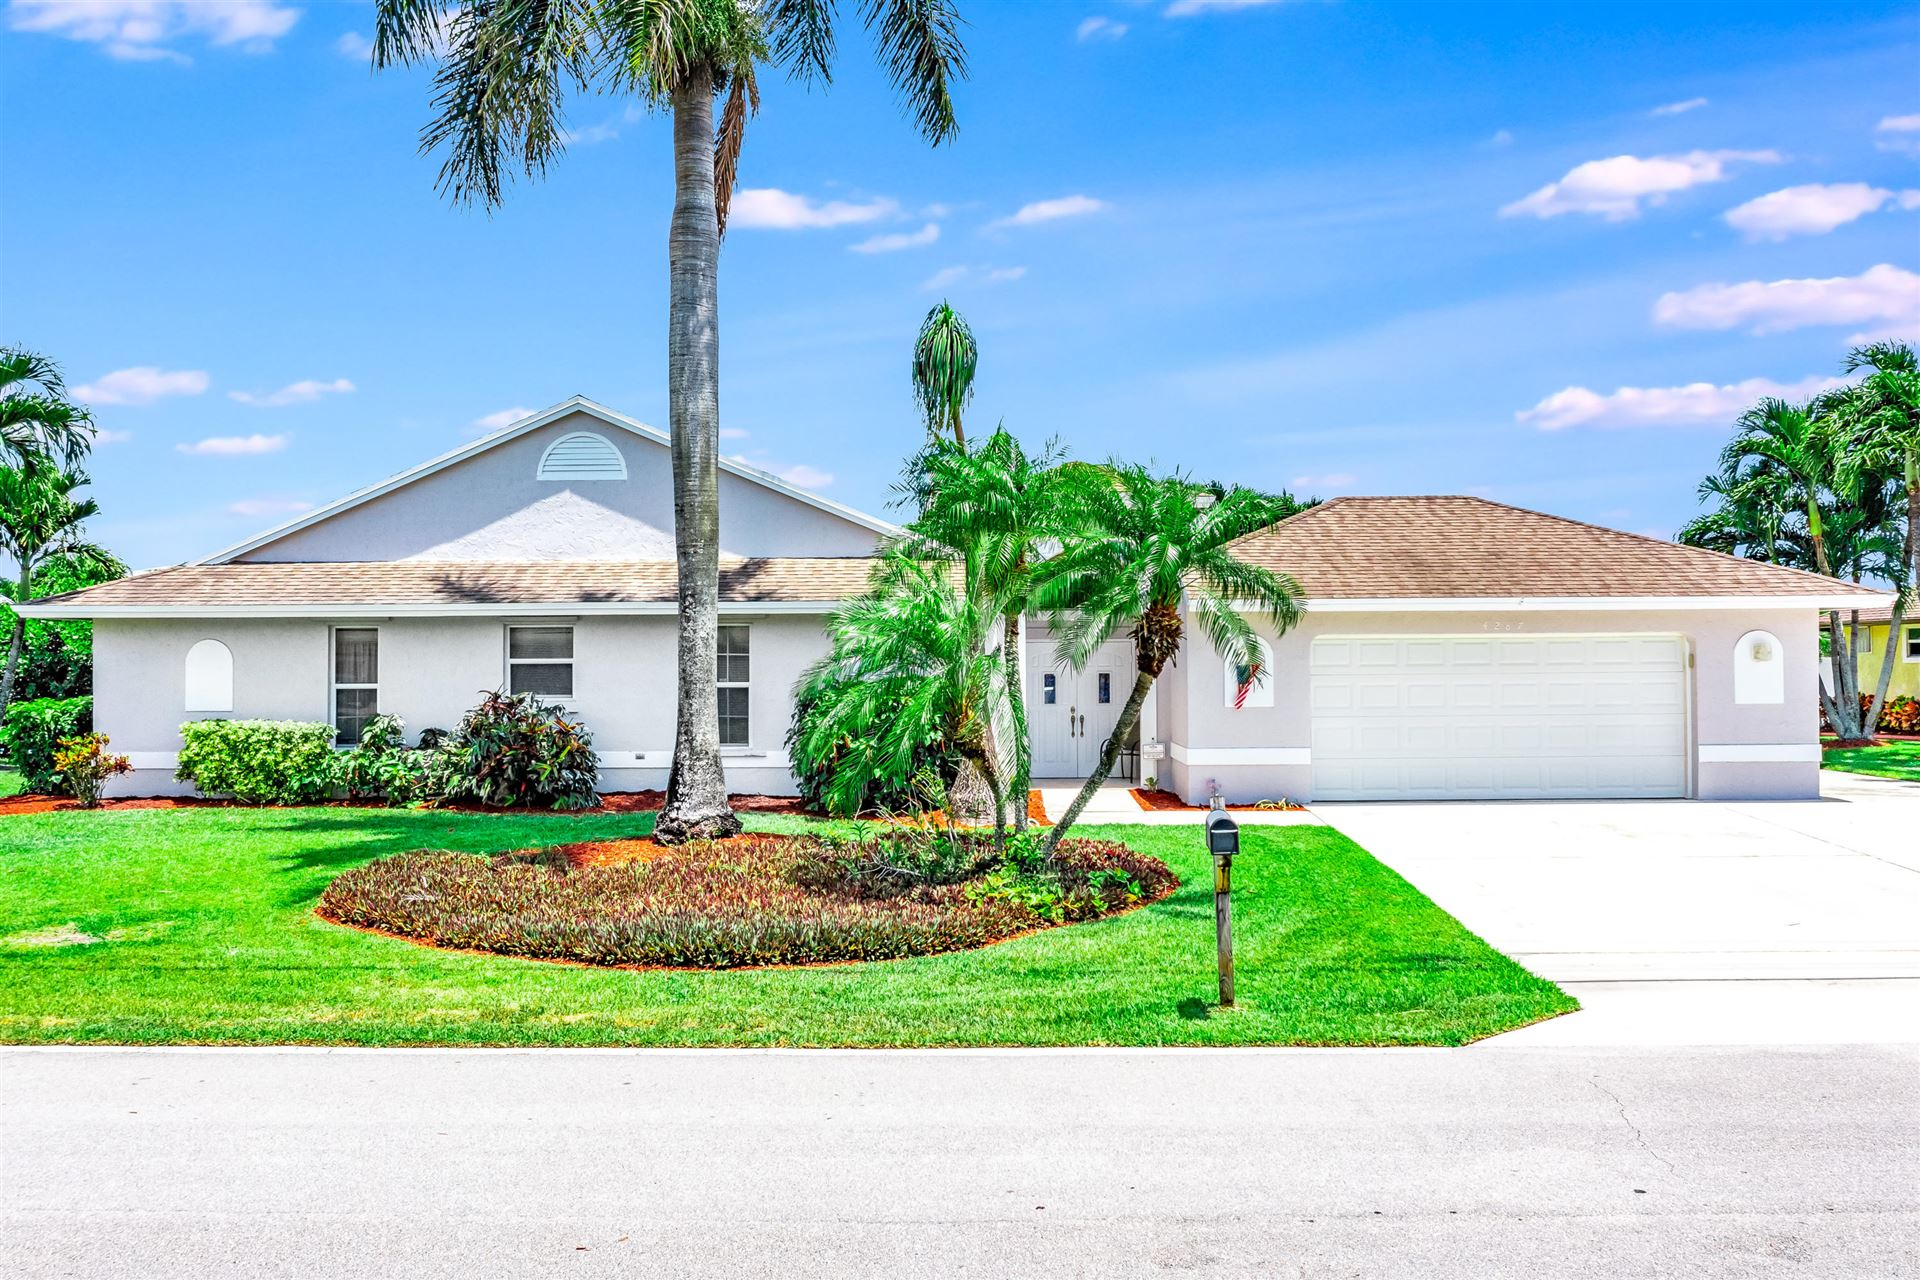 4287 Palo Verde Drive, Boynton Beach, FL 33436 - MLS#: RX-10716672